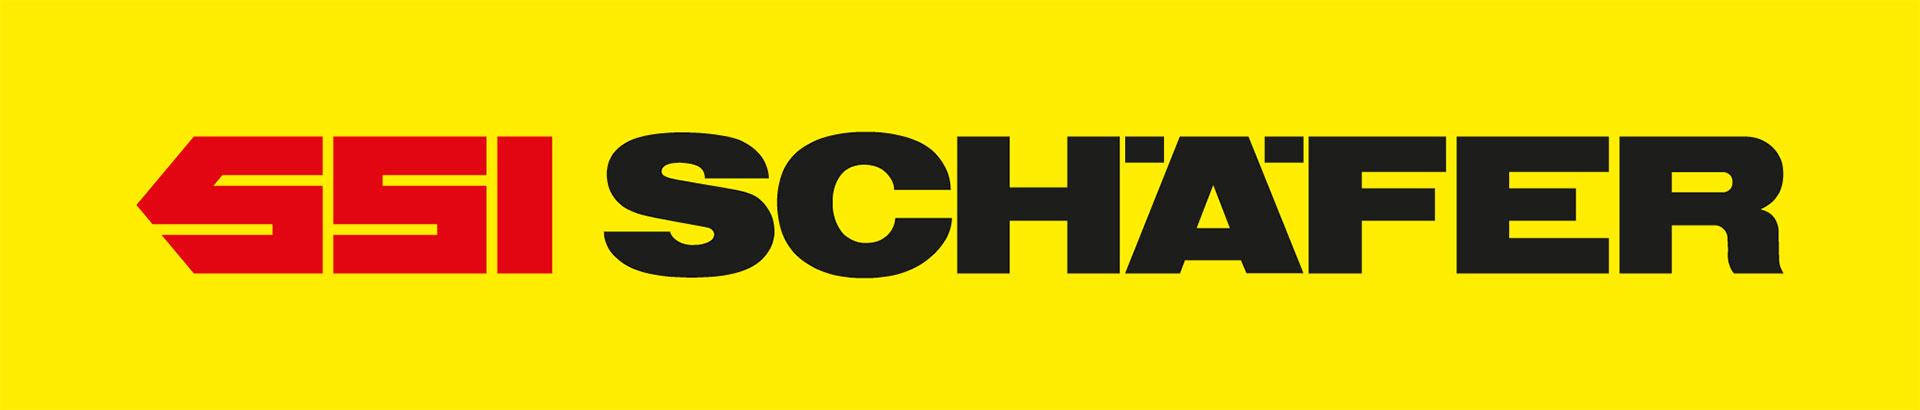 Logo_SSI_Schaefer